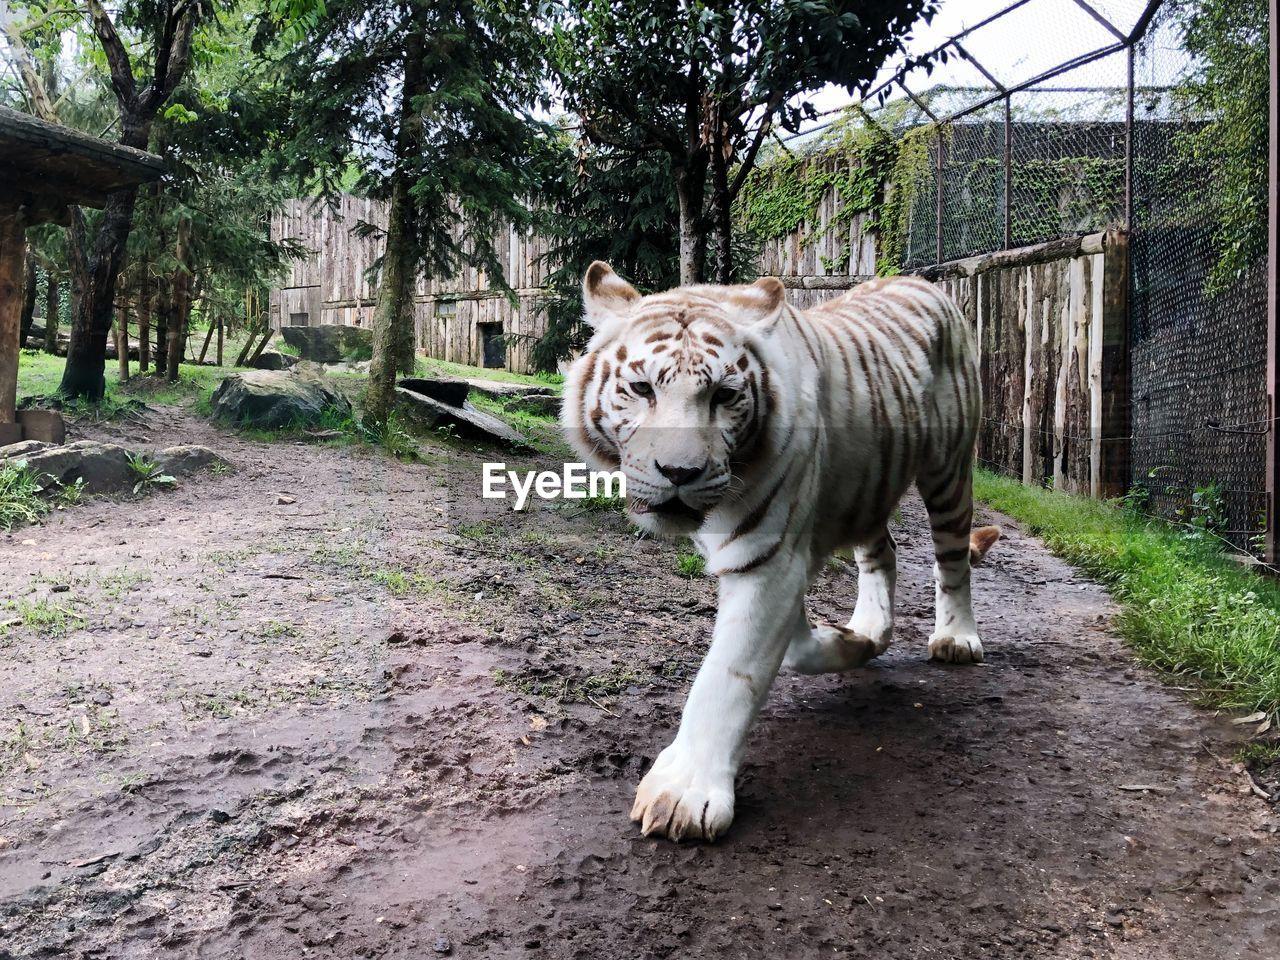 animal themes, animal, mammal, tree, one animal, animal wildlife, plant, feline, animals in the wild, day, nature, tiger, big cat, no people, cat, vertebrate, white tiger, walking, zoo, land, outdoors